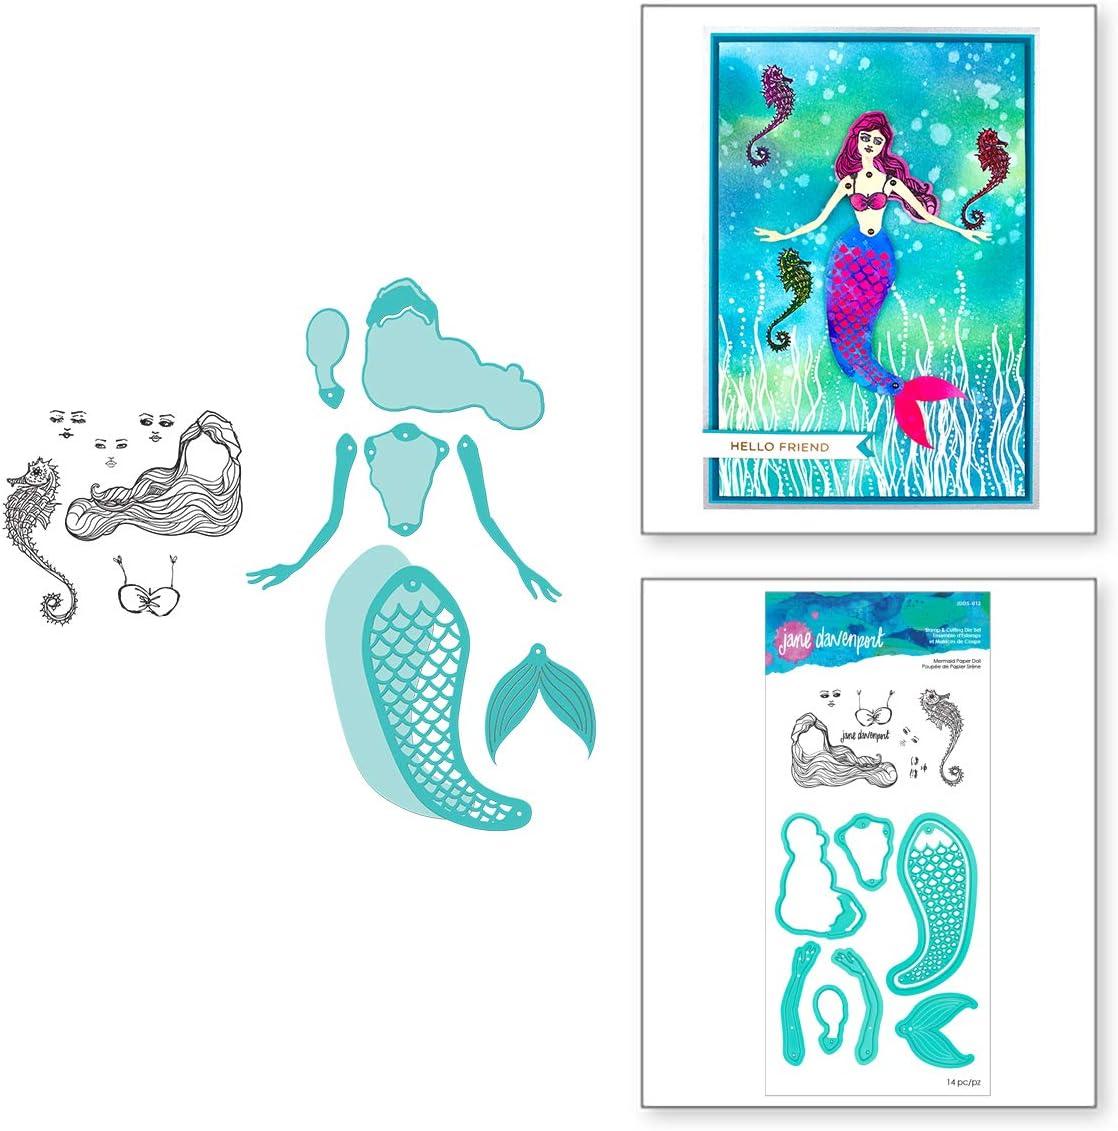 Pink /& Main Fantastic Stamp and Die Set cards scrapbooking fish bowl sentiments 17 stamps16 dies paper crafting seashells seaweed